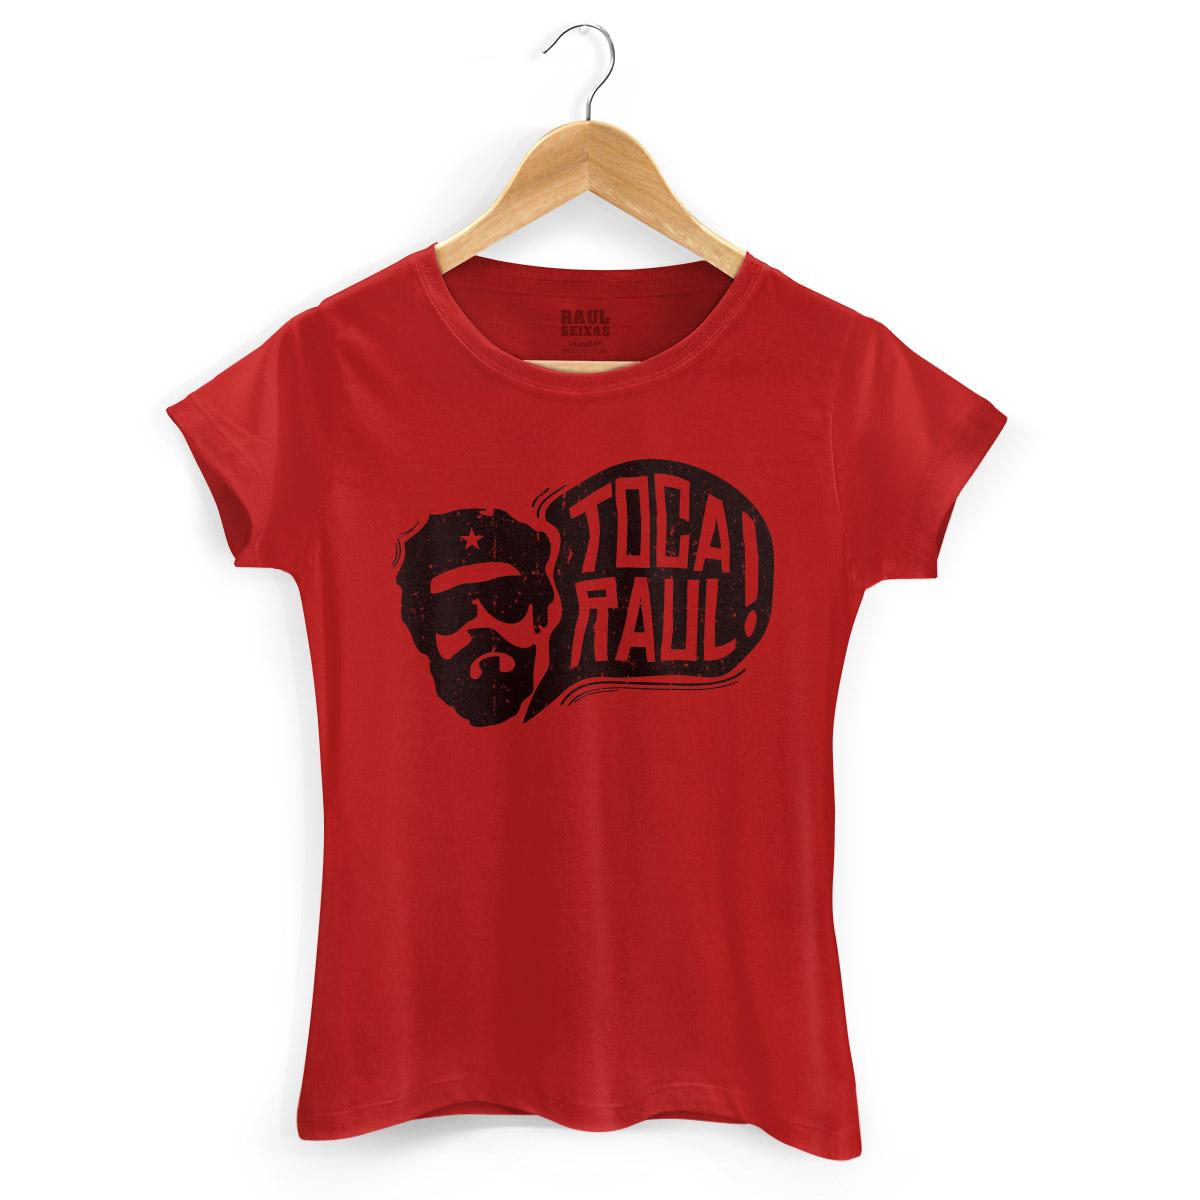 Camiseta Feminina Raul Seixas Toca Raul! 2